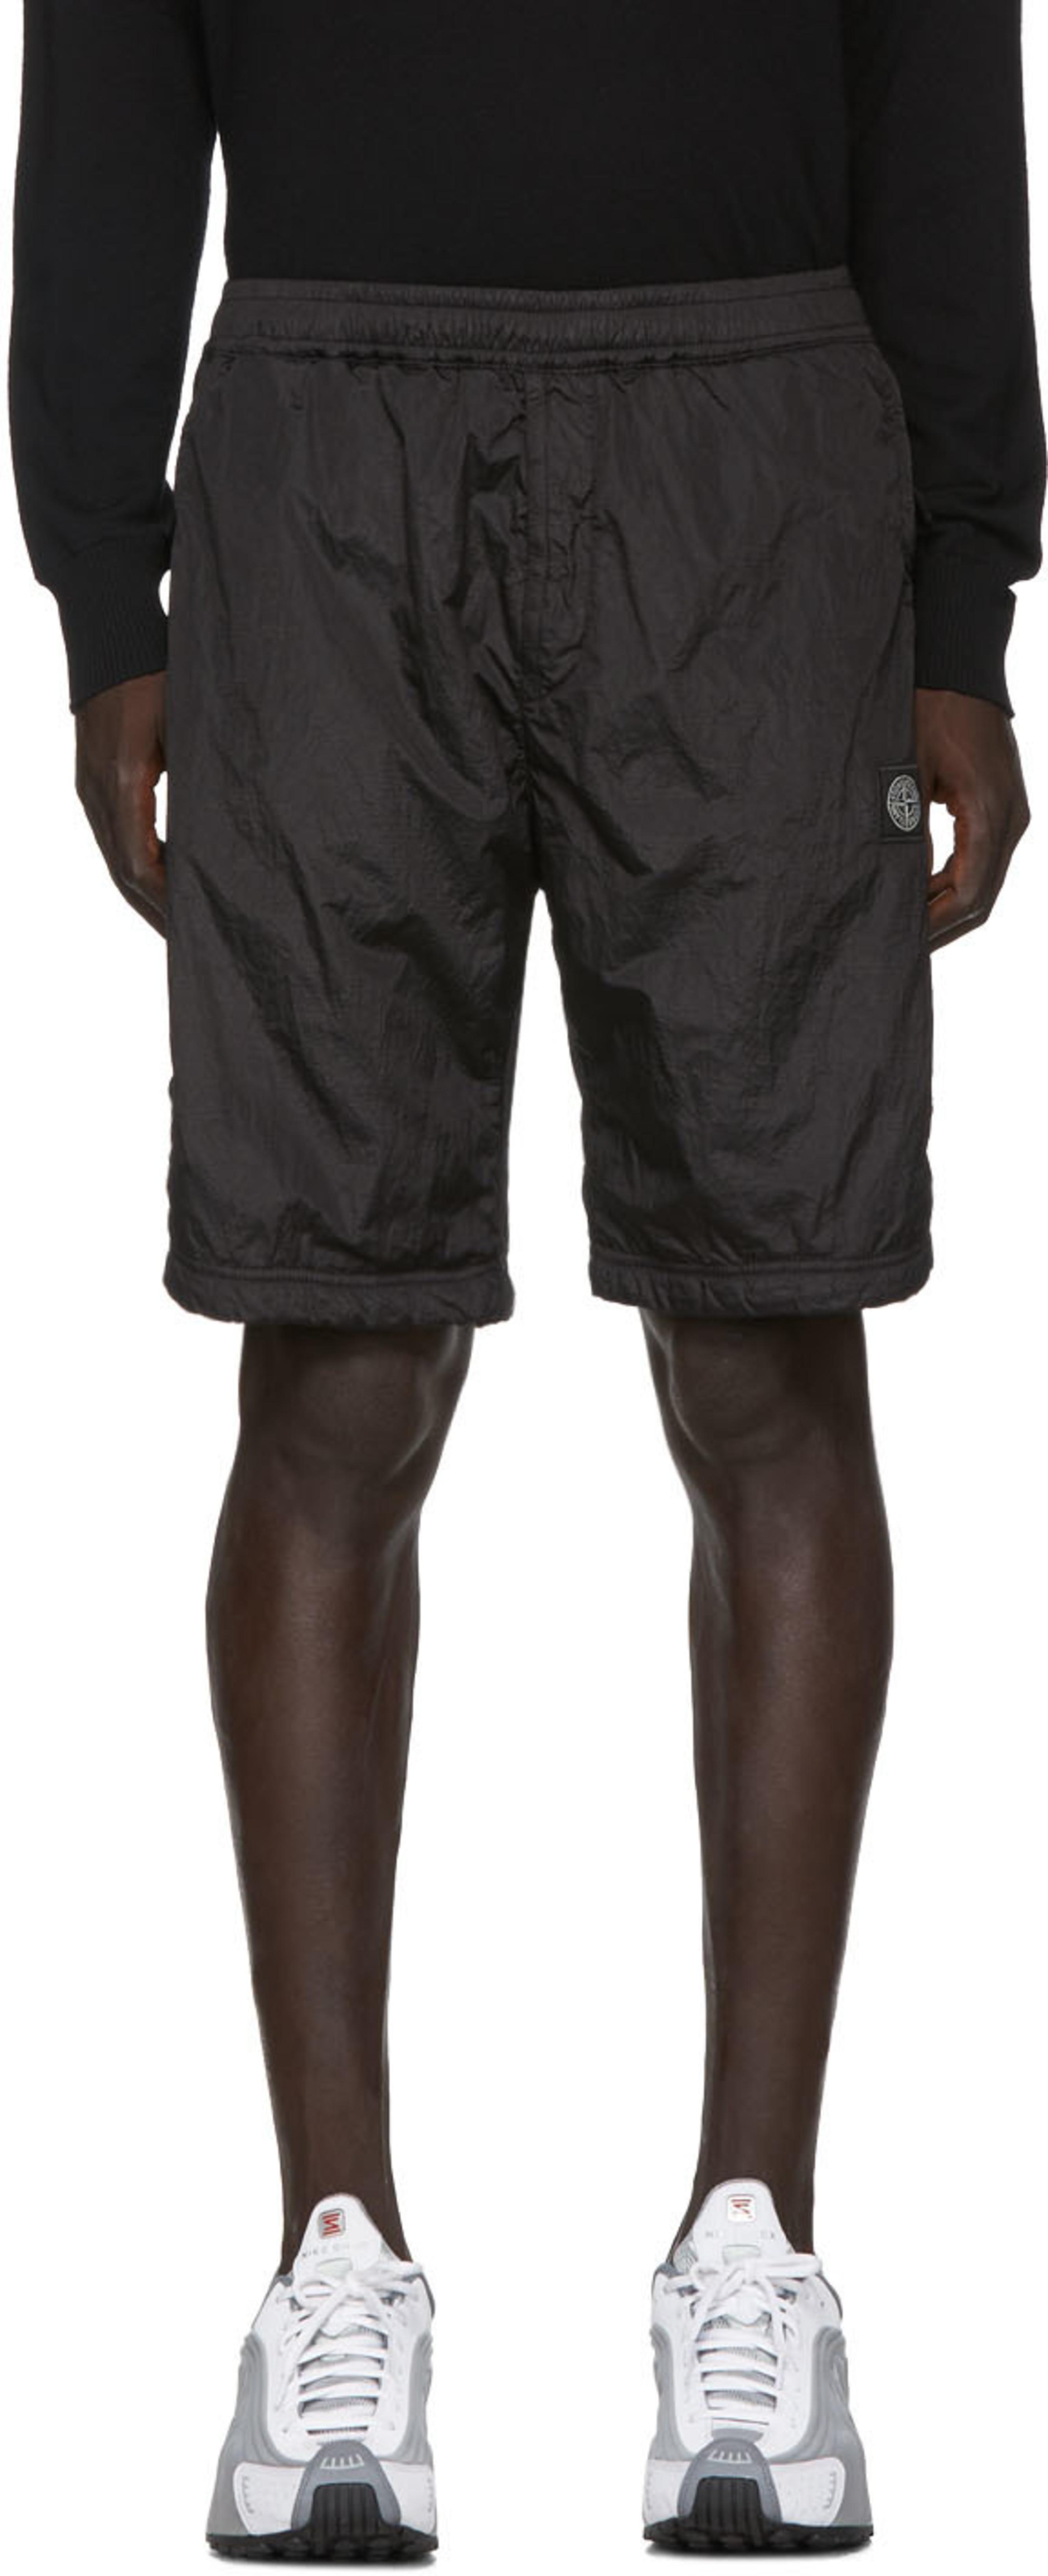 adidas Originals SHORTS (Adidas originals shorts) (GREY ONE F17) 18SS I